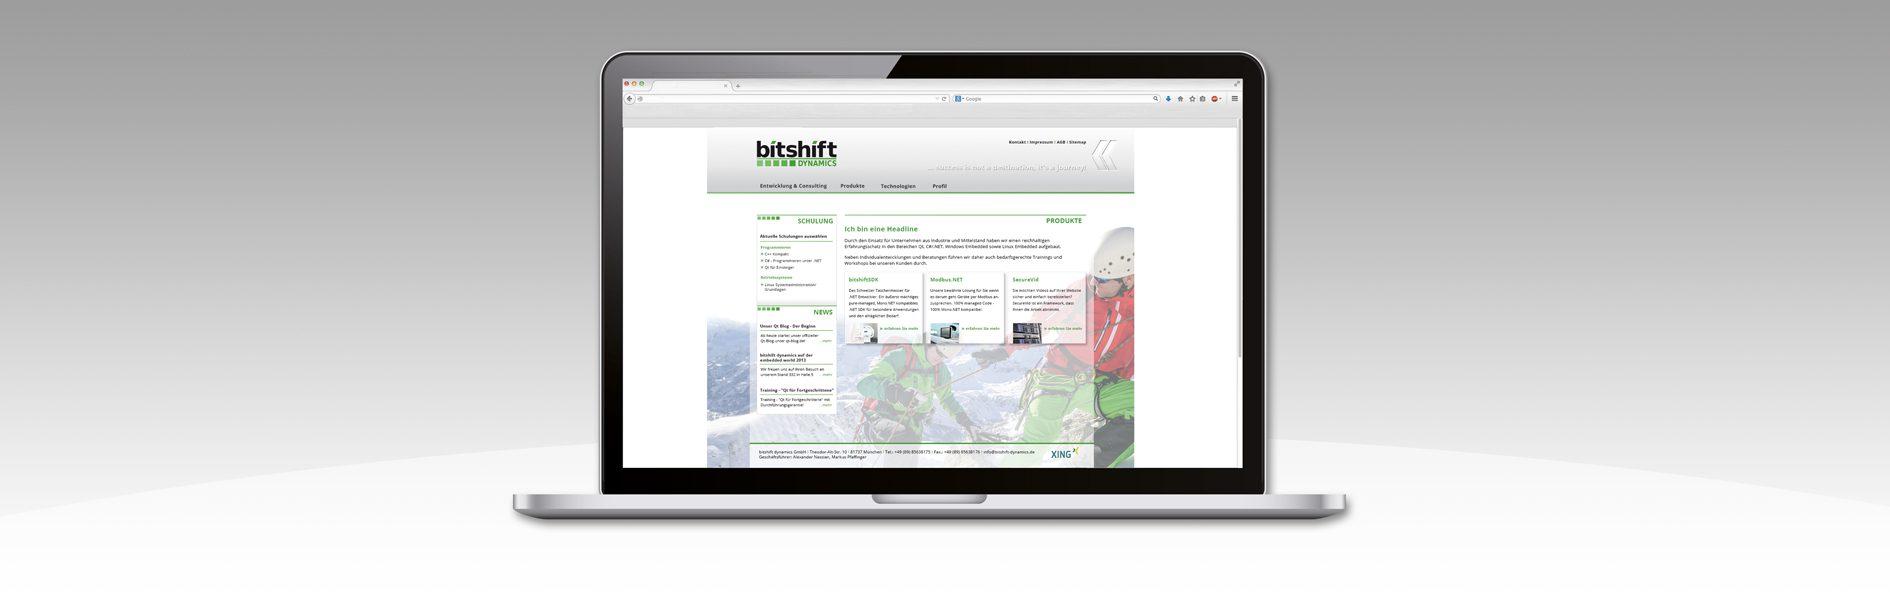 Hier ist das bitshift Screendesign abgebildet.